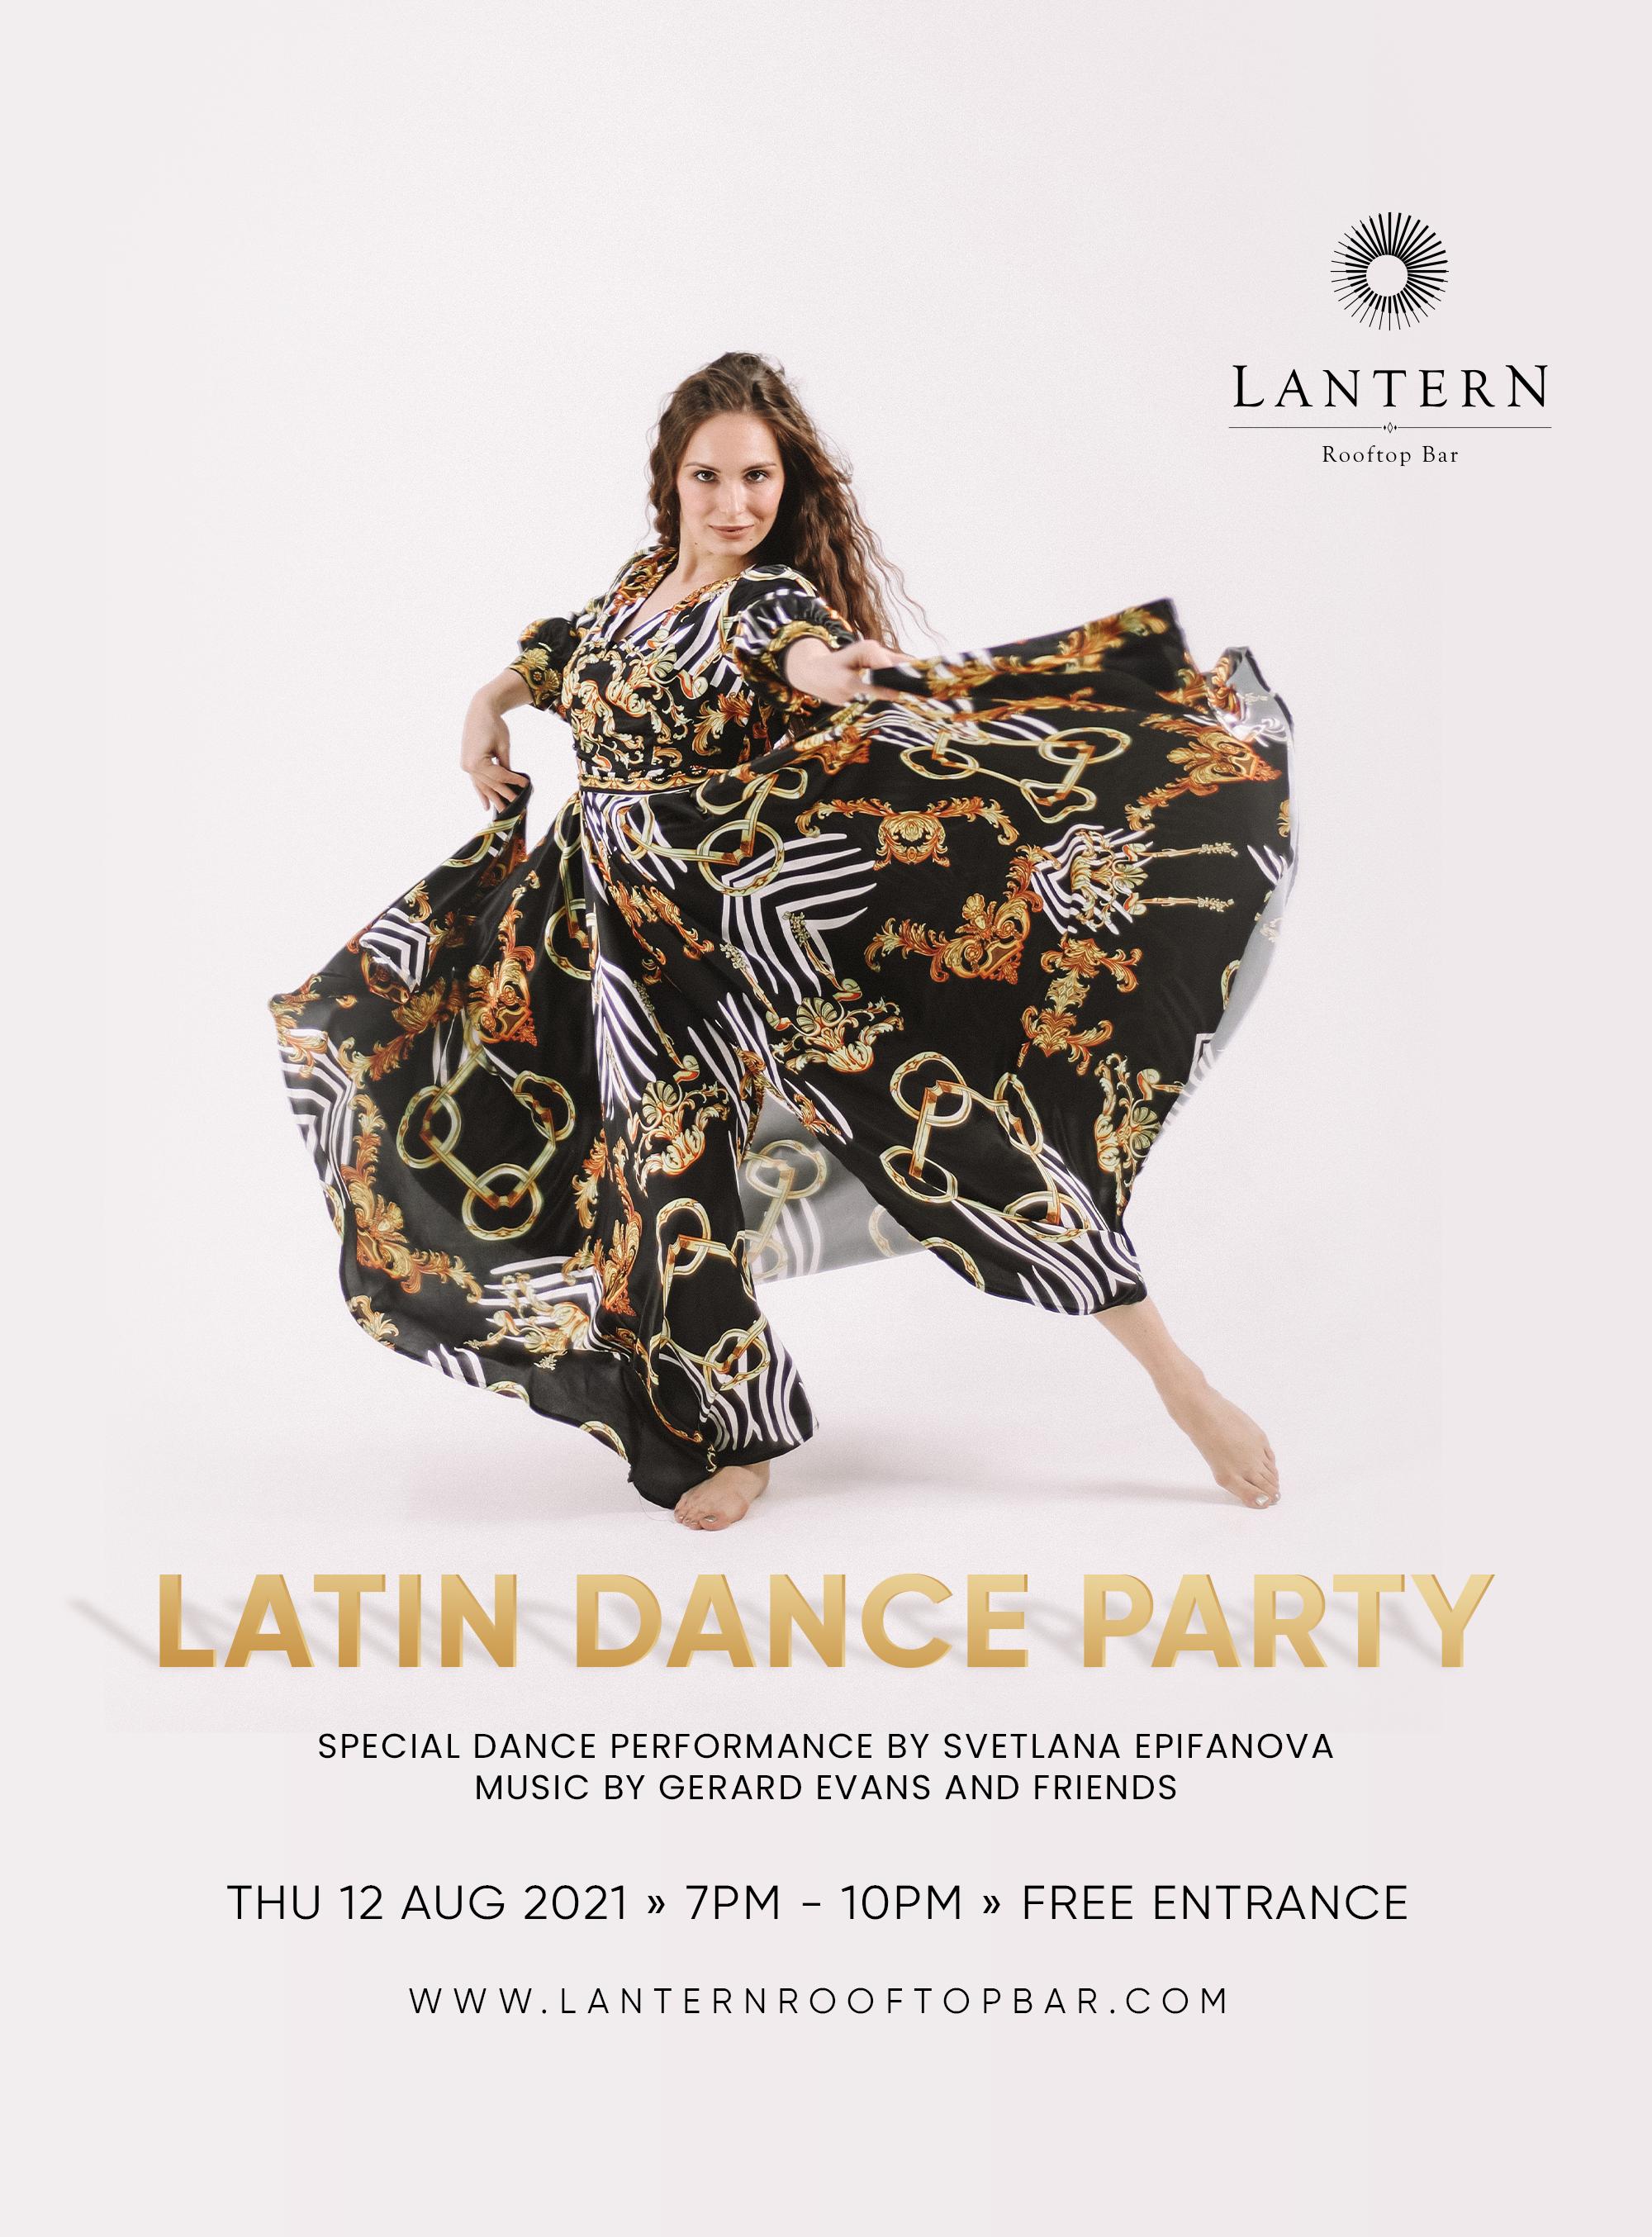 Latin Dance Party Lantern Rooftop Bar